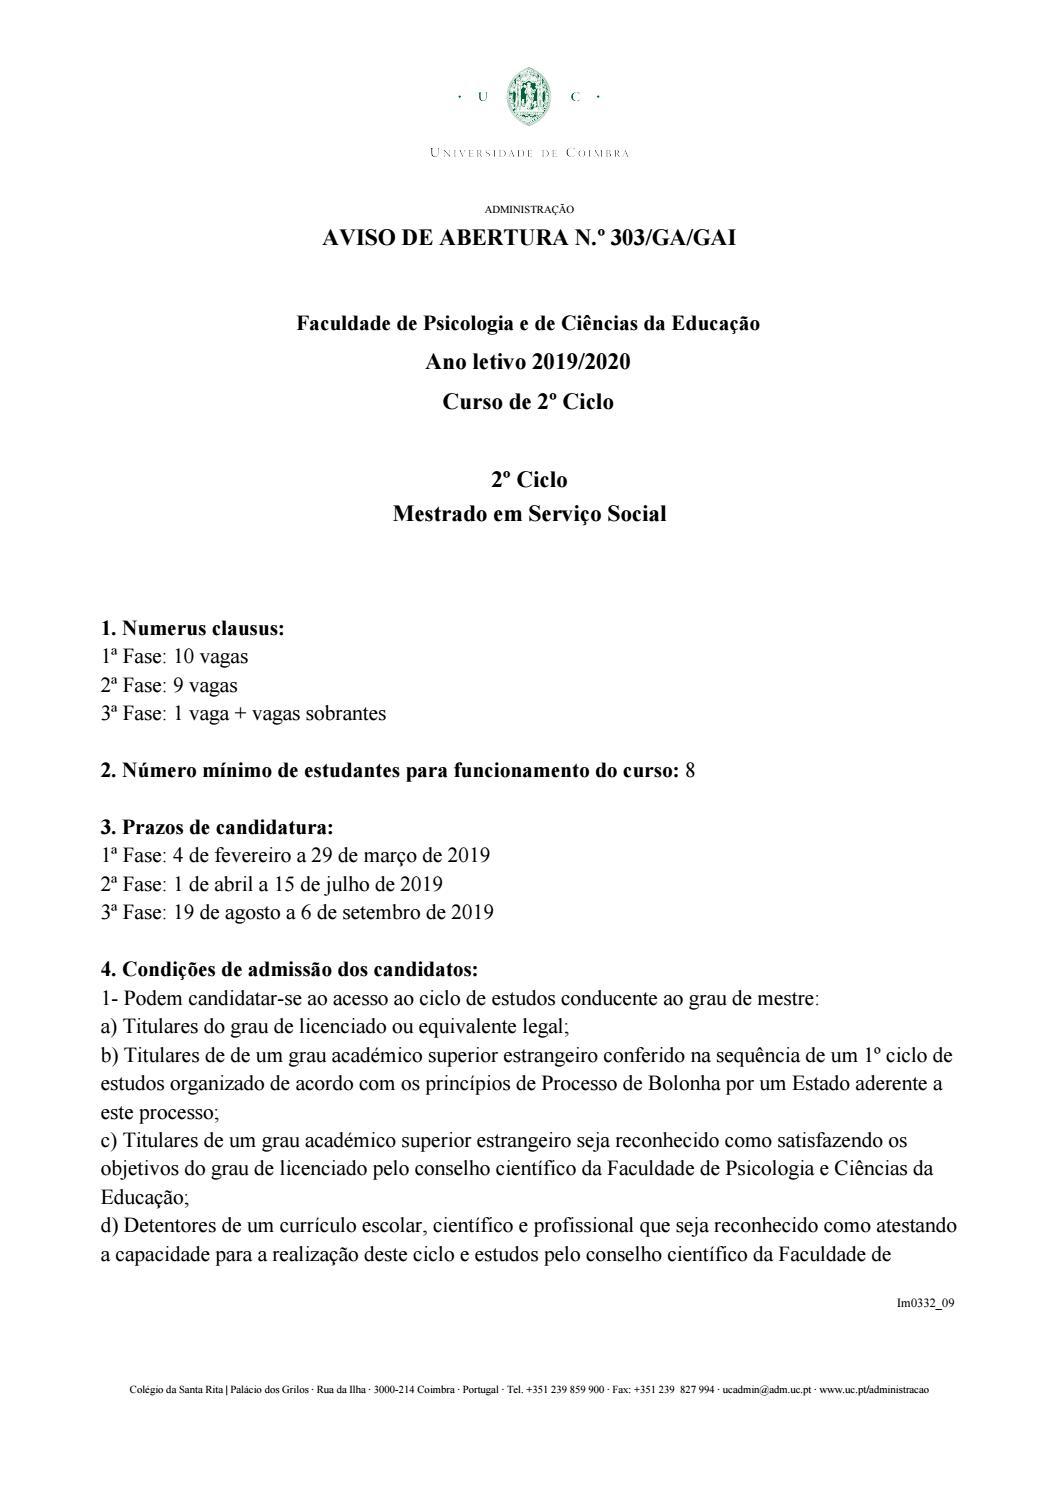 Edital Candidaturas Mss 2019 2020 By Helena Neves Almeida